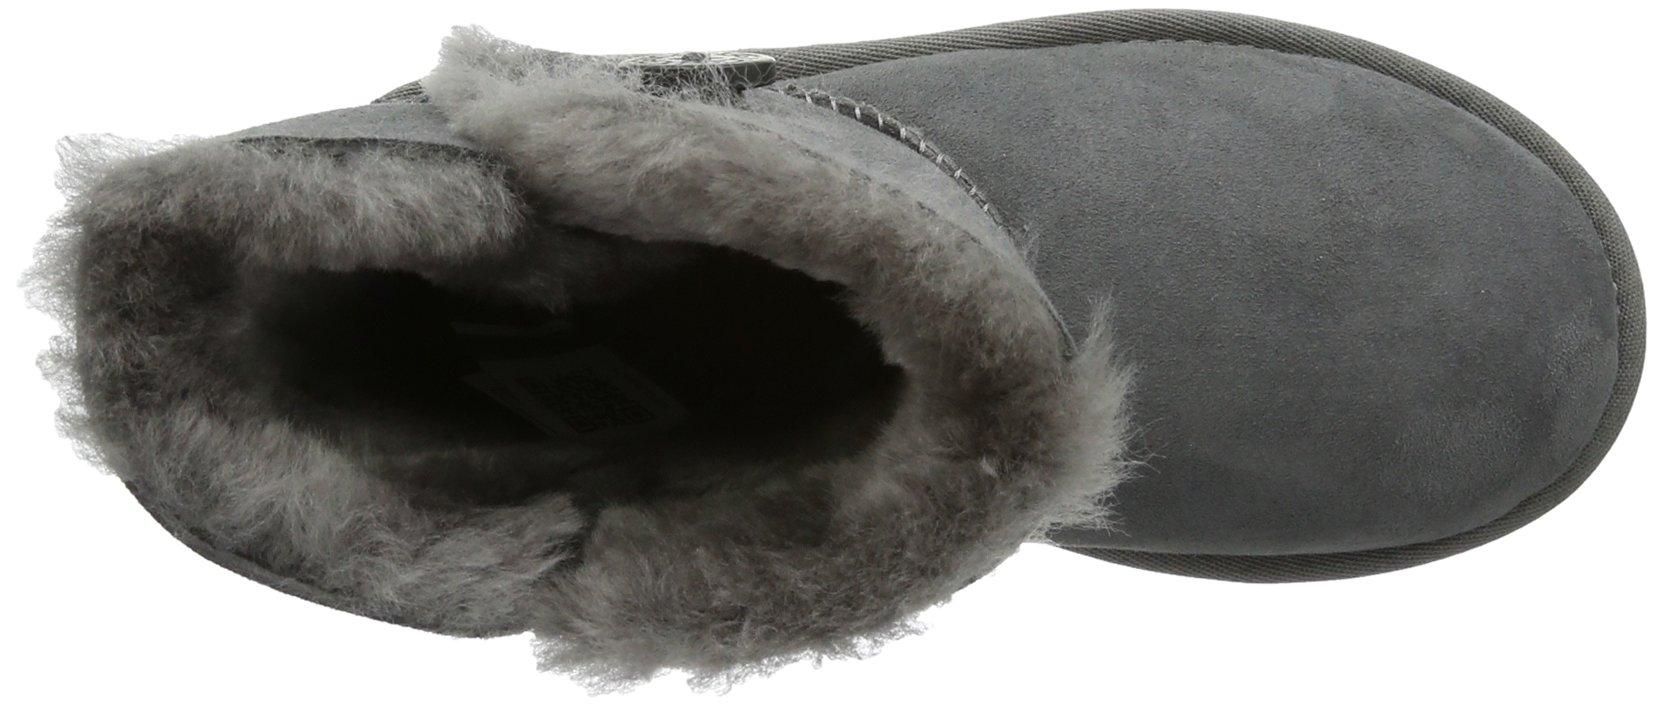 Ugg Australia Bailey Button Girls' Boots, gris (Grigio (grey)), 9 UK Child by UGG (Image #7)